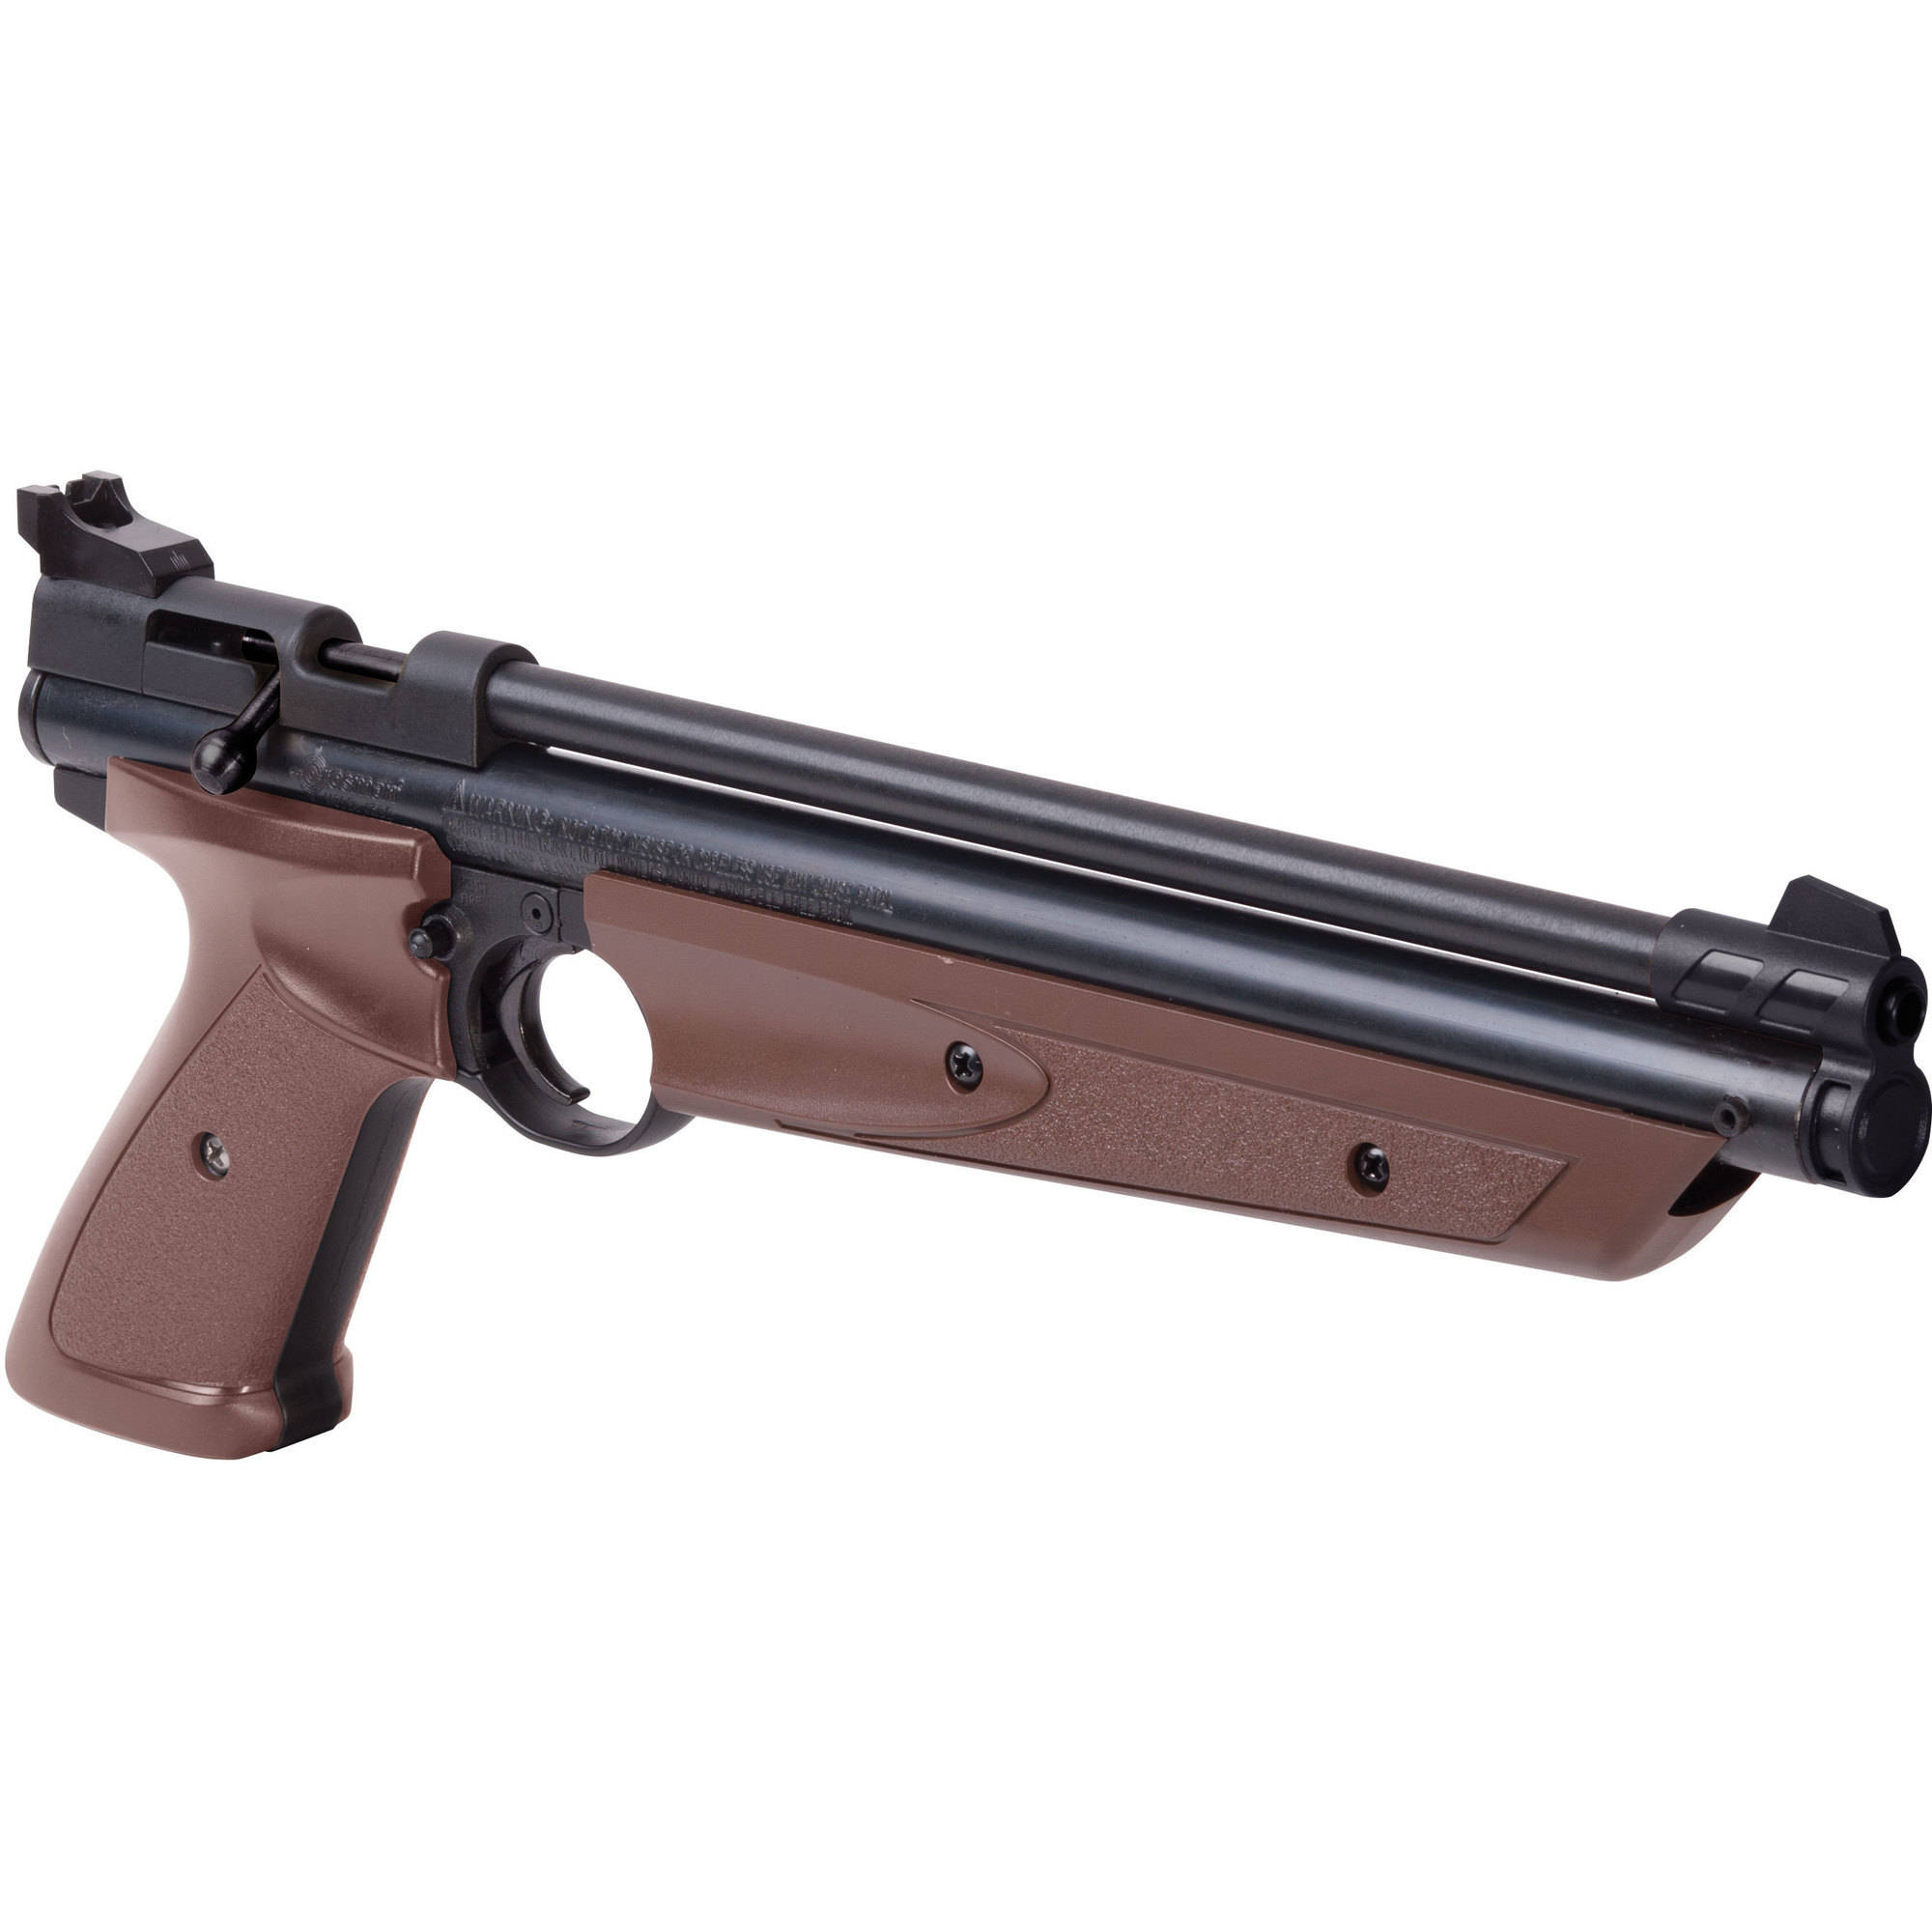 Crosman 1377 American Classic Pistol by Crosman